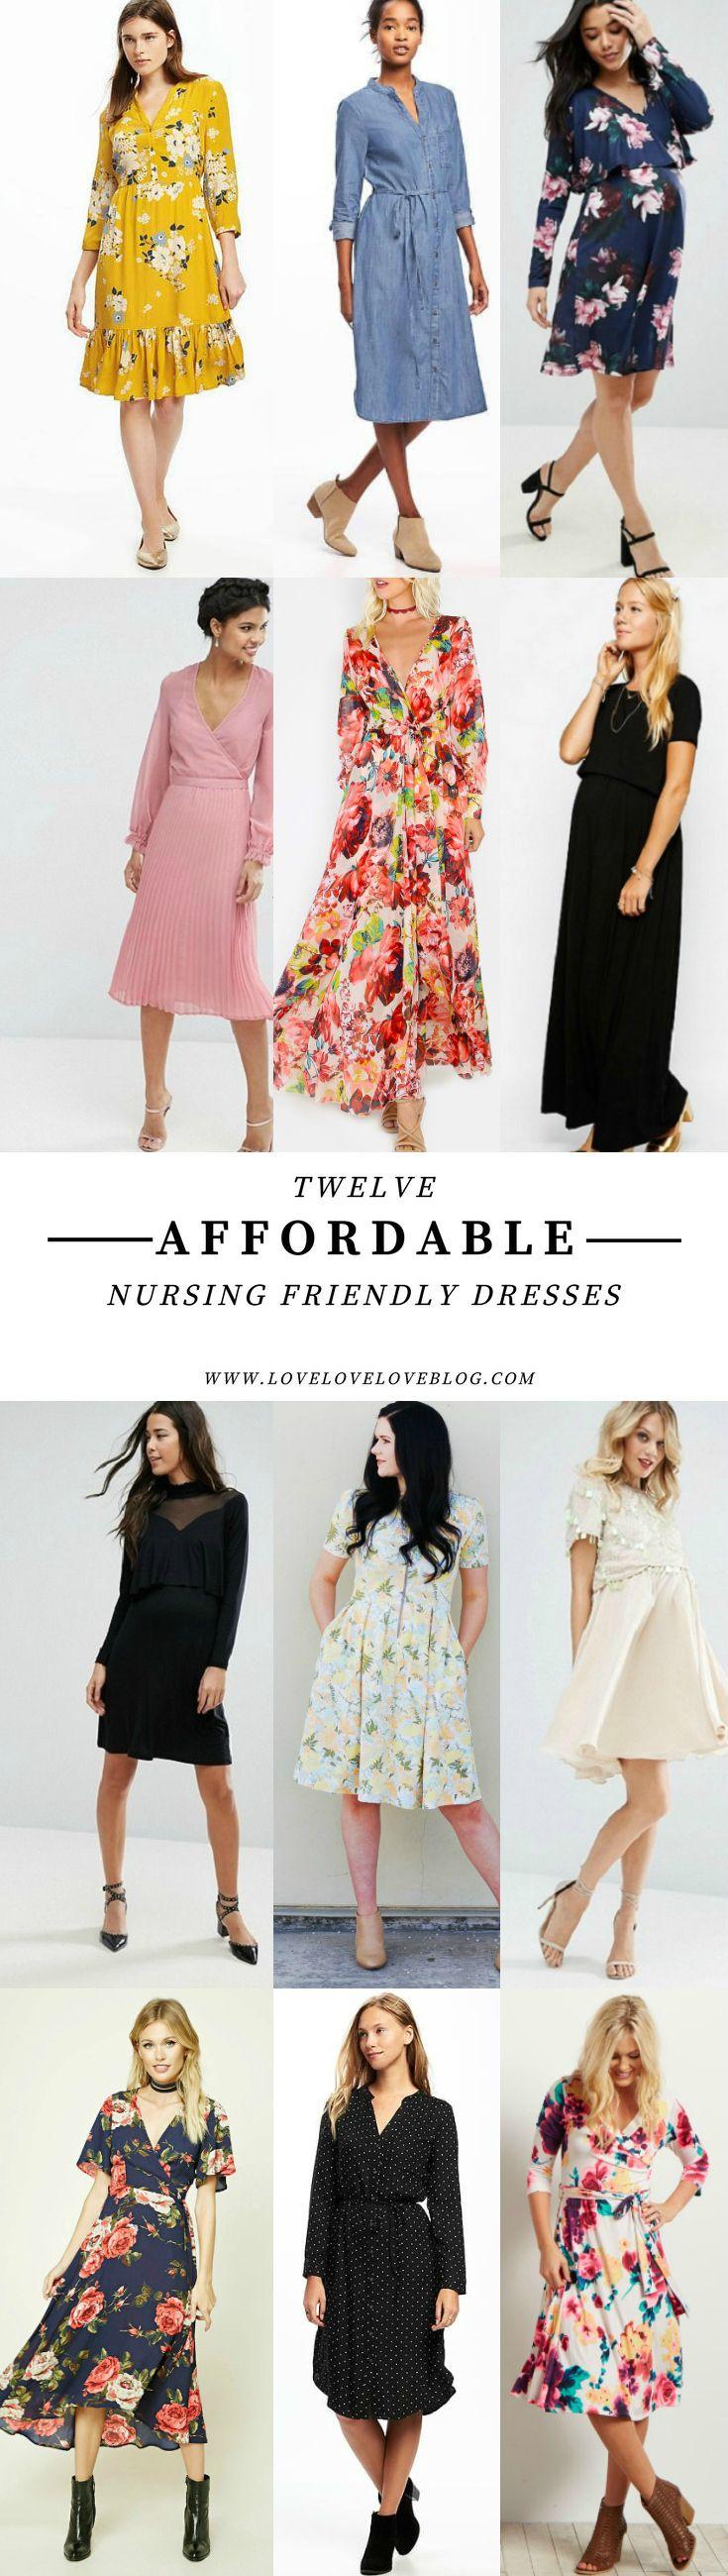 Love Love Love: Affordable Nursing Friendly Dresses